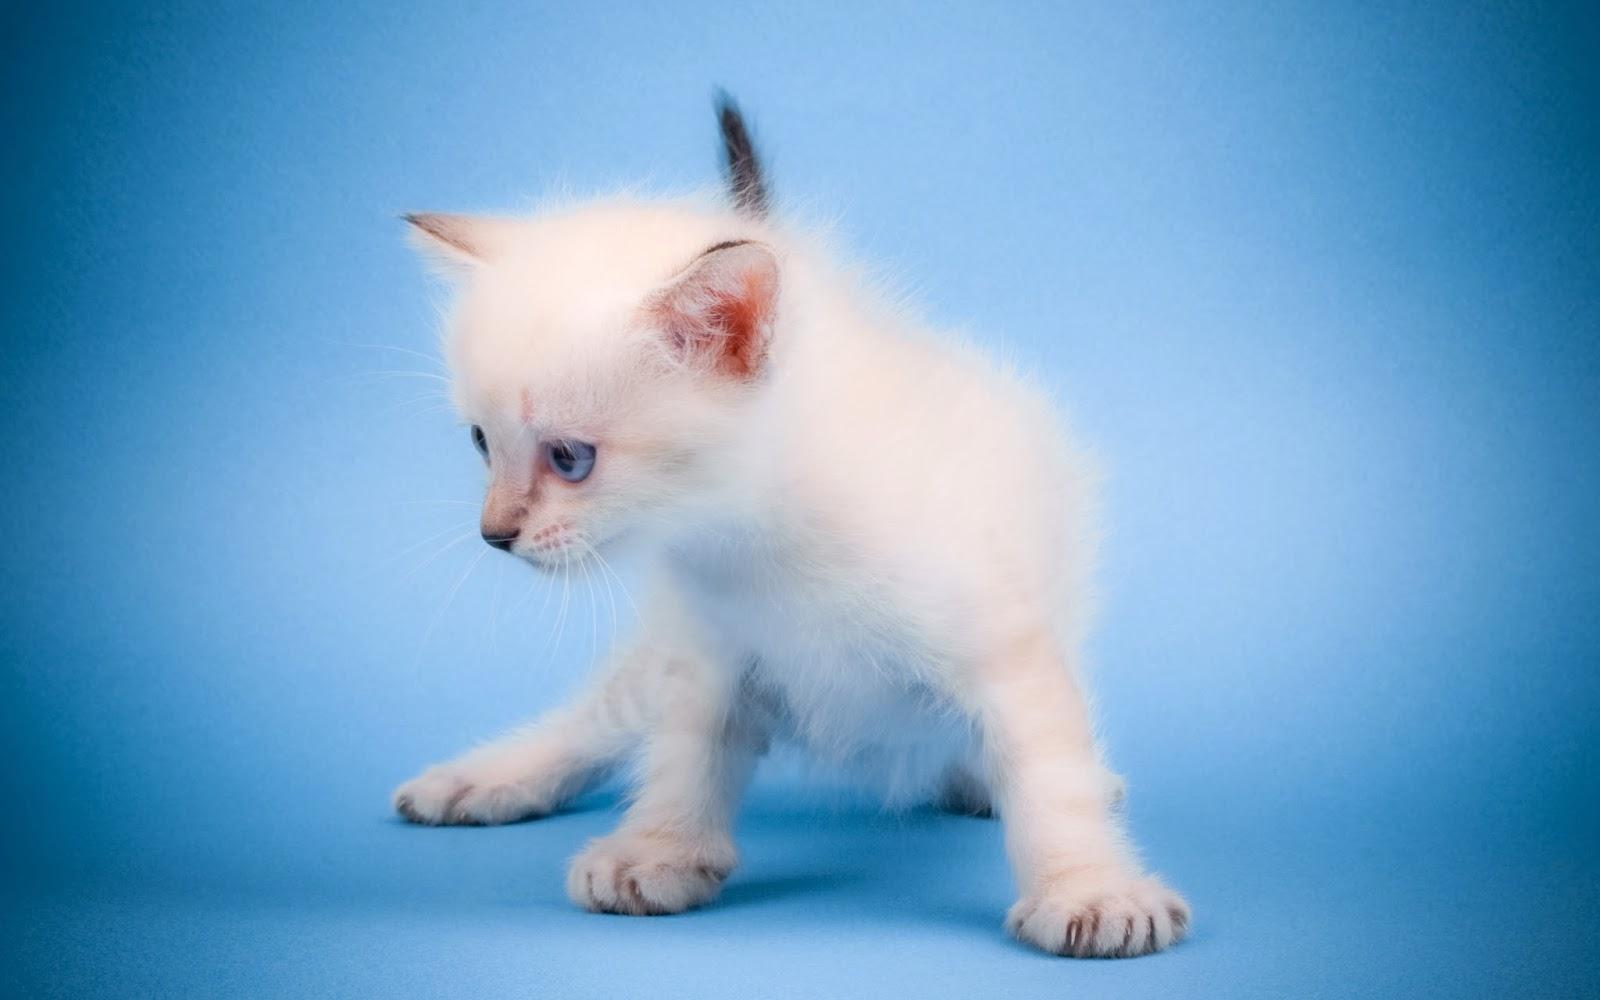 "<img src=""http://2.bp.blogspot.com/-Rx8GCh1eaN4/UuqjpdNWrAI/AAAAAAAAKrM/5eDUEUcW_08/s1600/cute-mew-mew-cat-wallpaper.jpg"" alt=""cute mew mew cat wallpaper"" />"